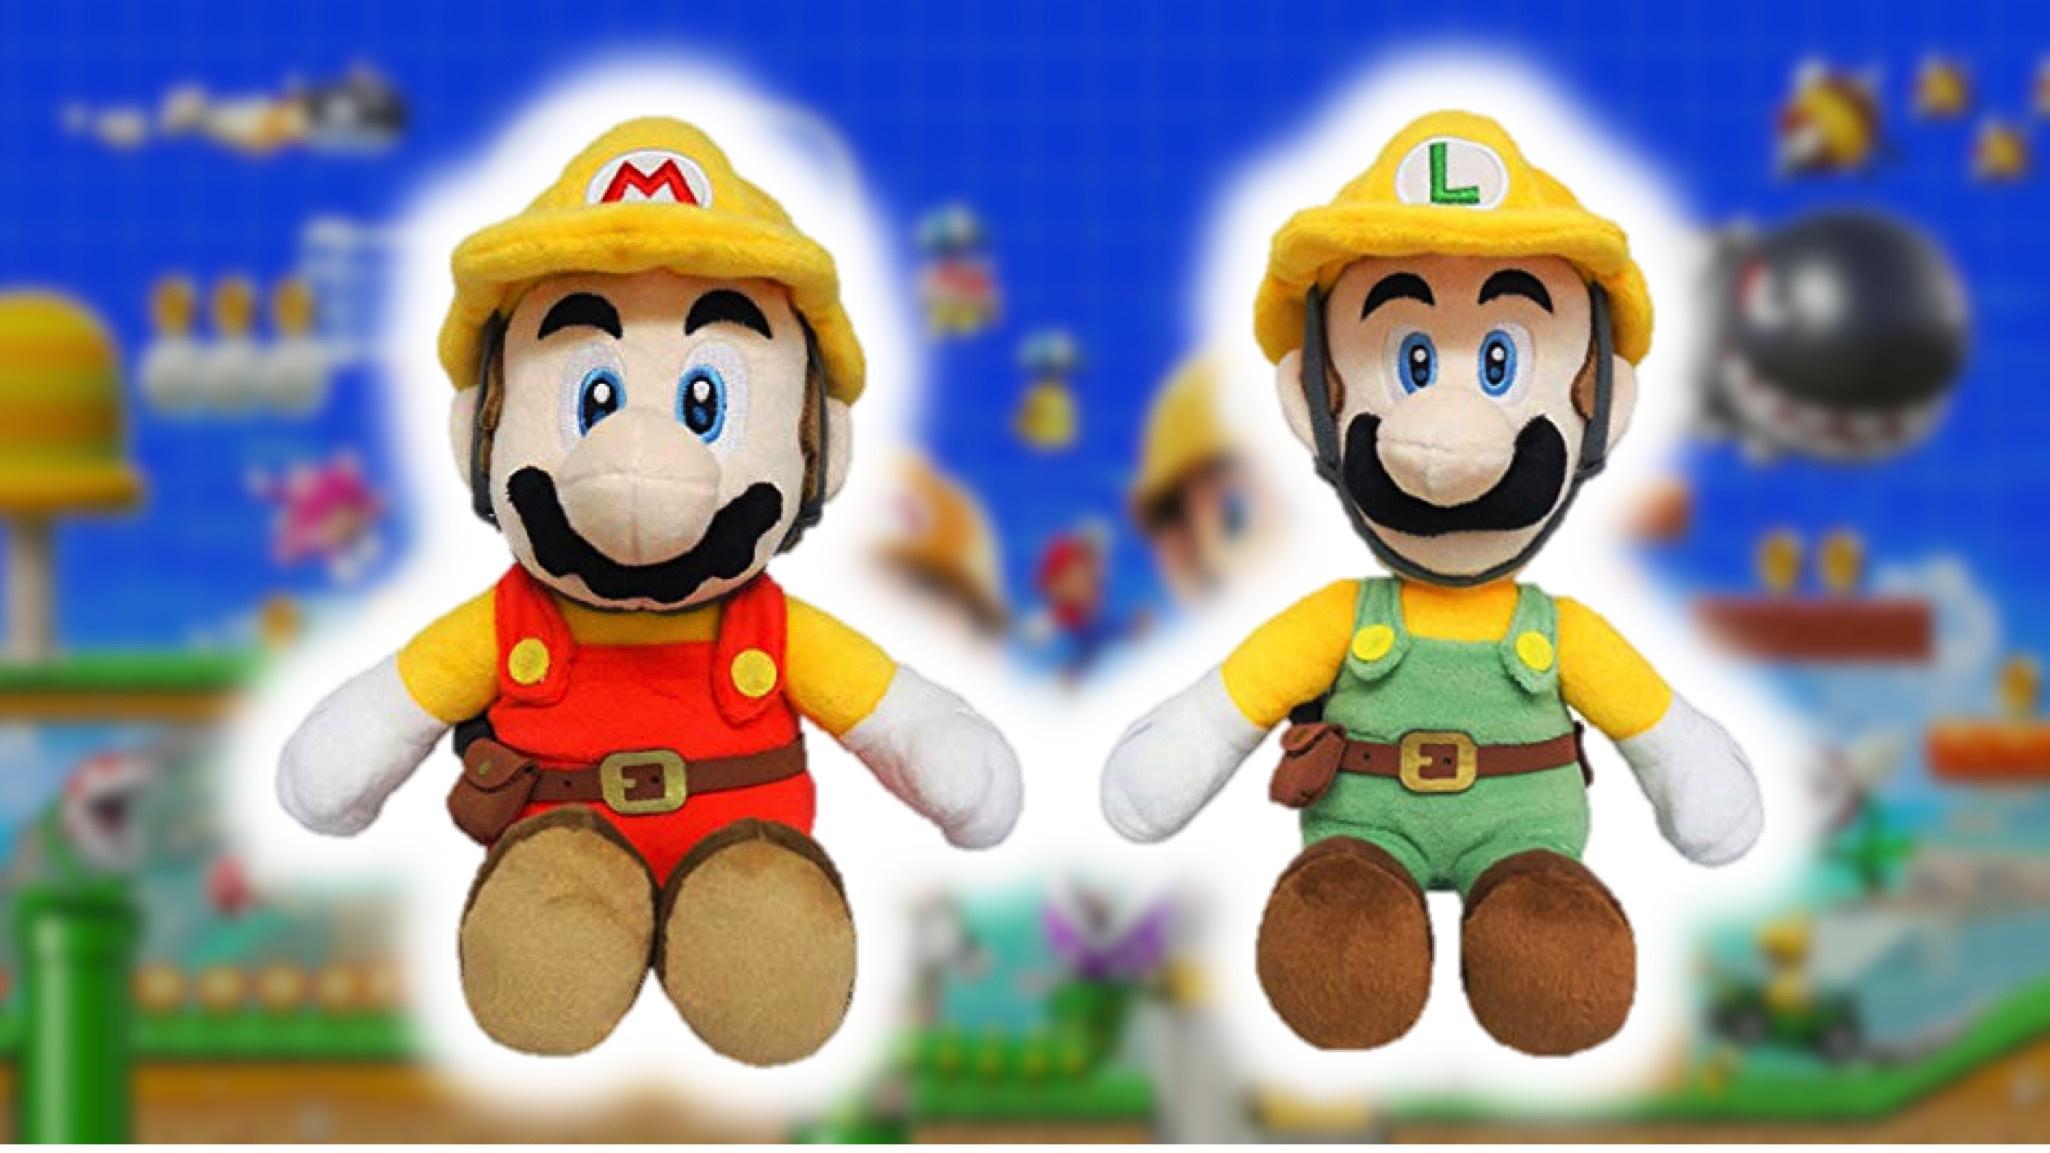 Trihex causes Super Mario Maker 2 creator to 'rage delete' their level